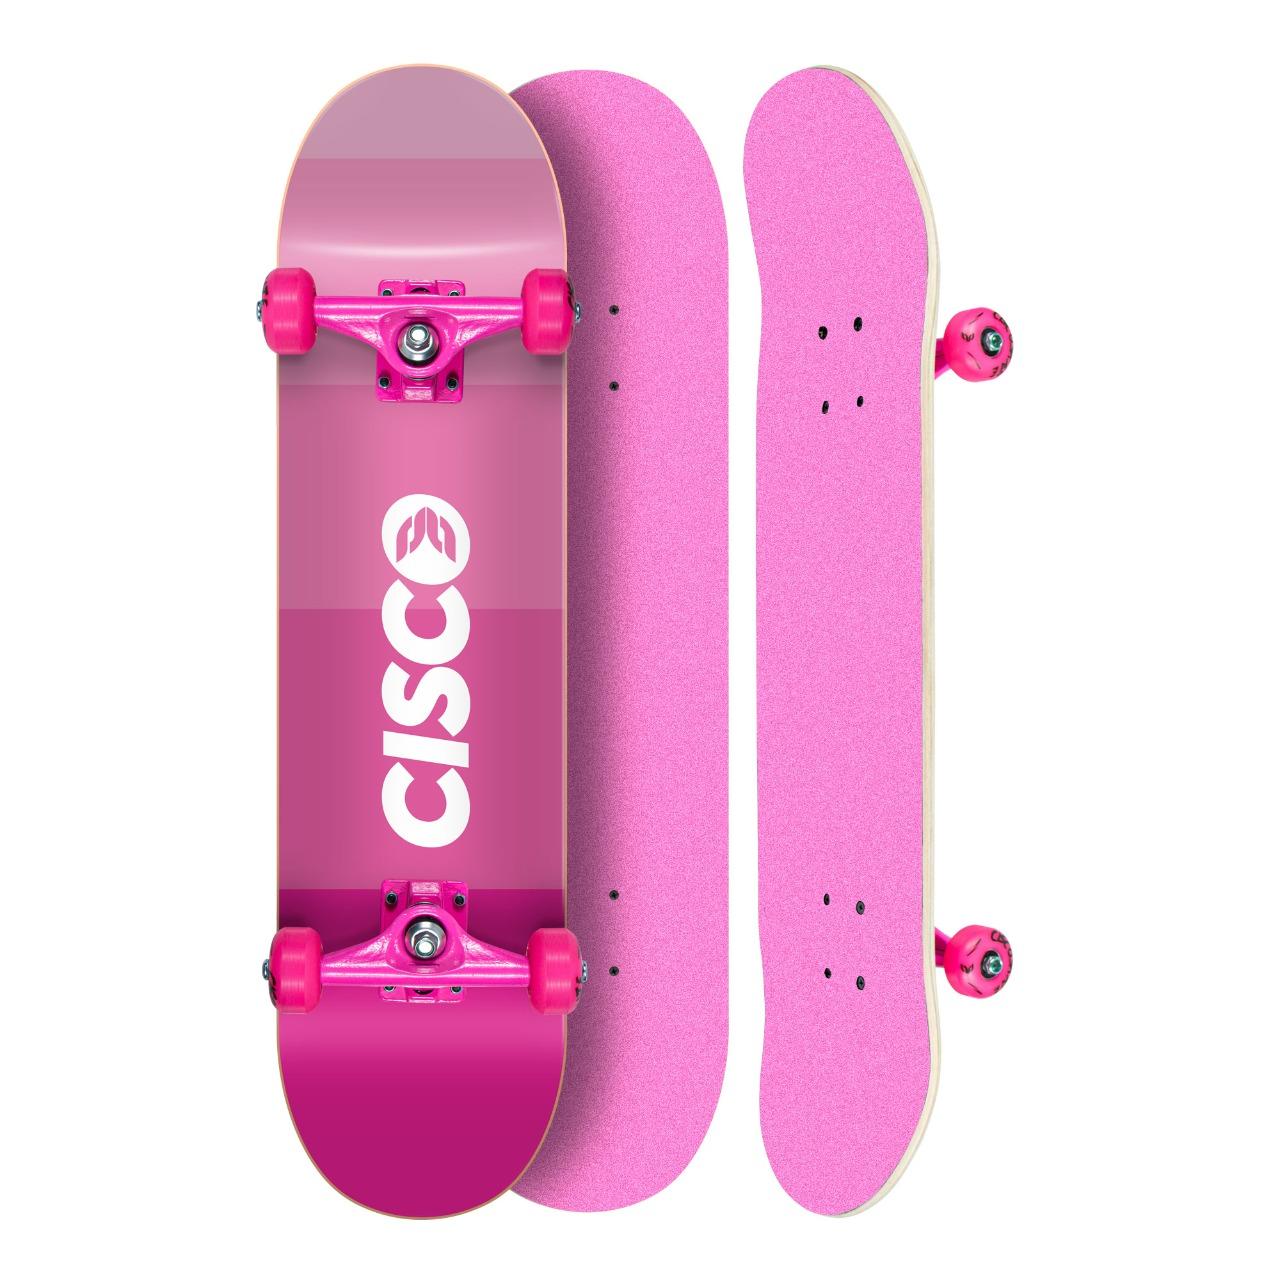 "Skate Montado Profissional Cisco Feminino Degrade - Truck/Roda/Lixa Rosa 8"""